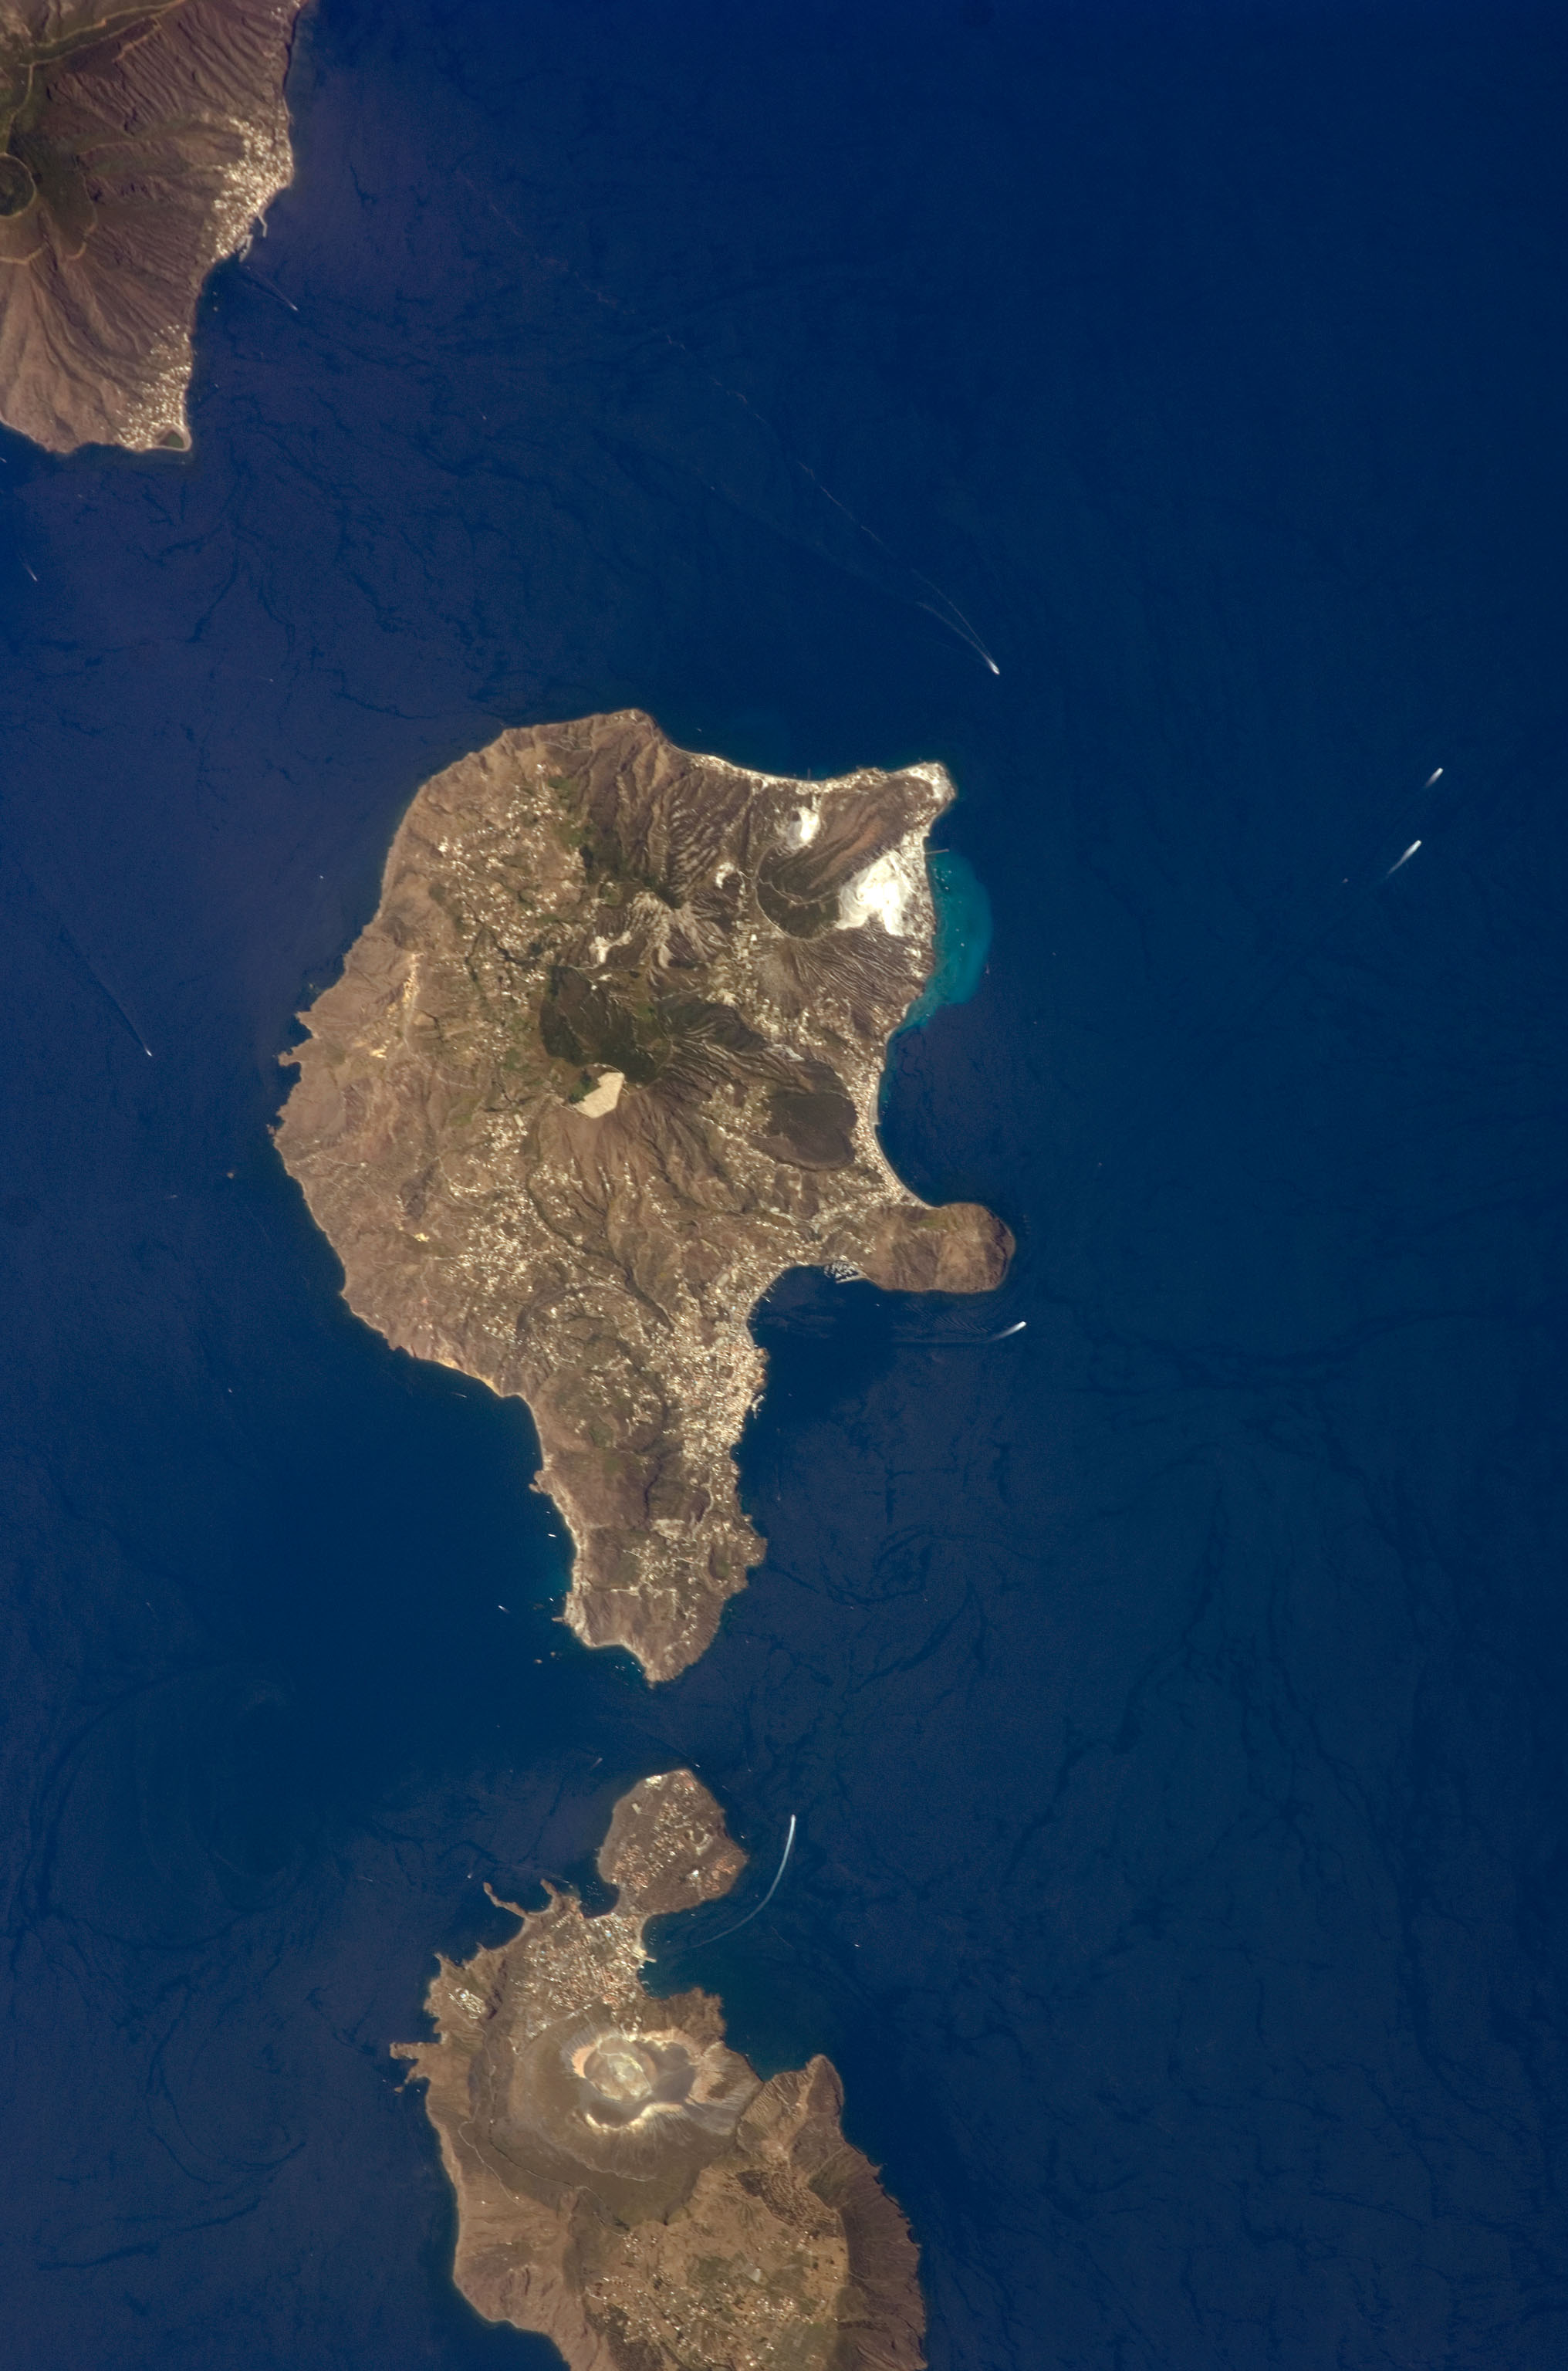 Quần đảo Eolie